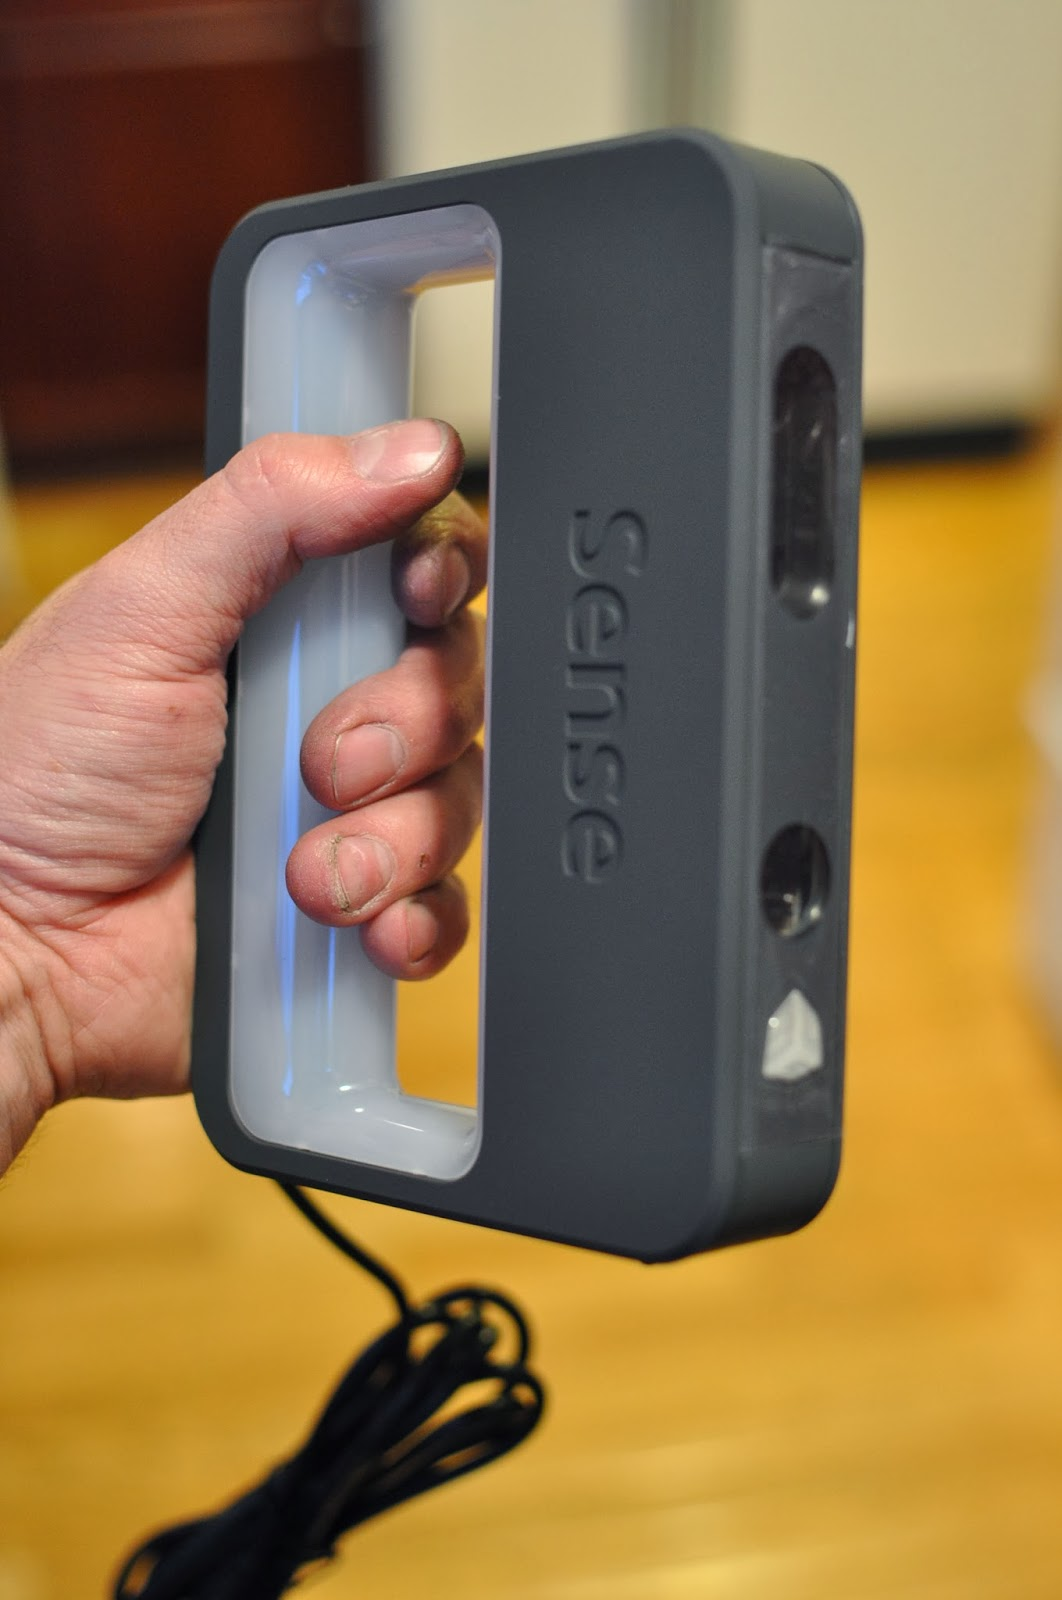 handverker: 3d systems sense scanner